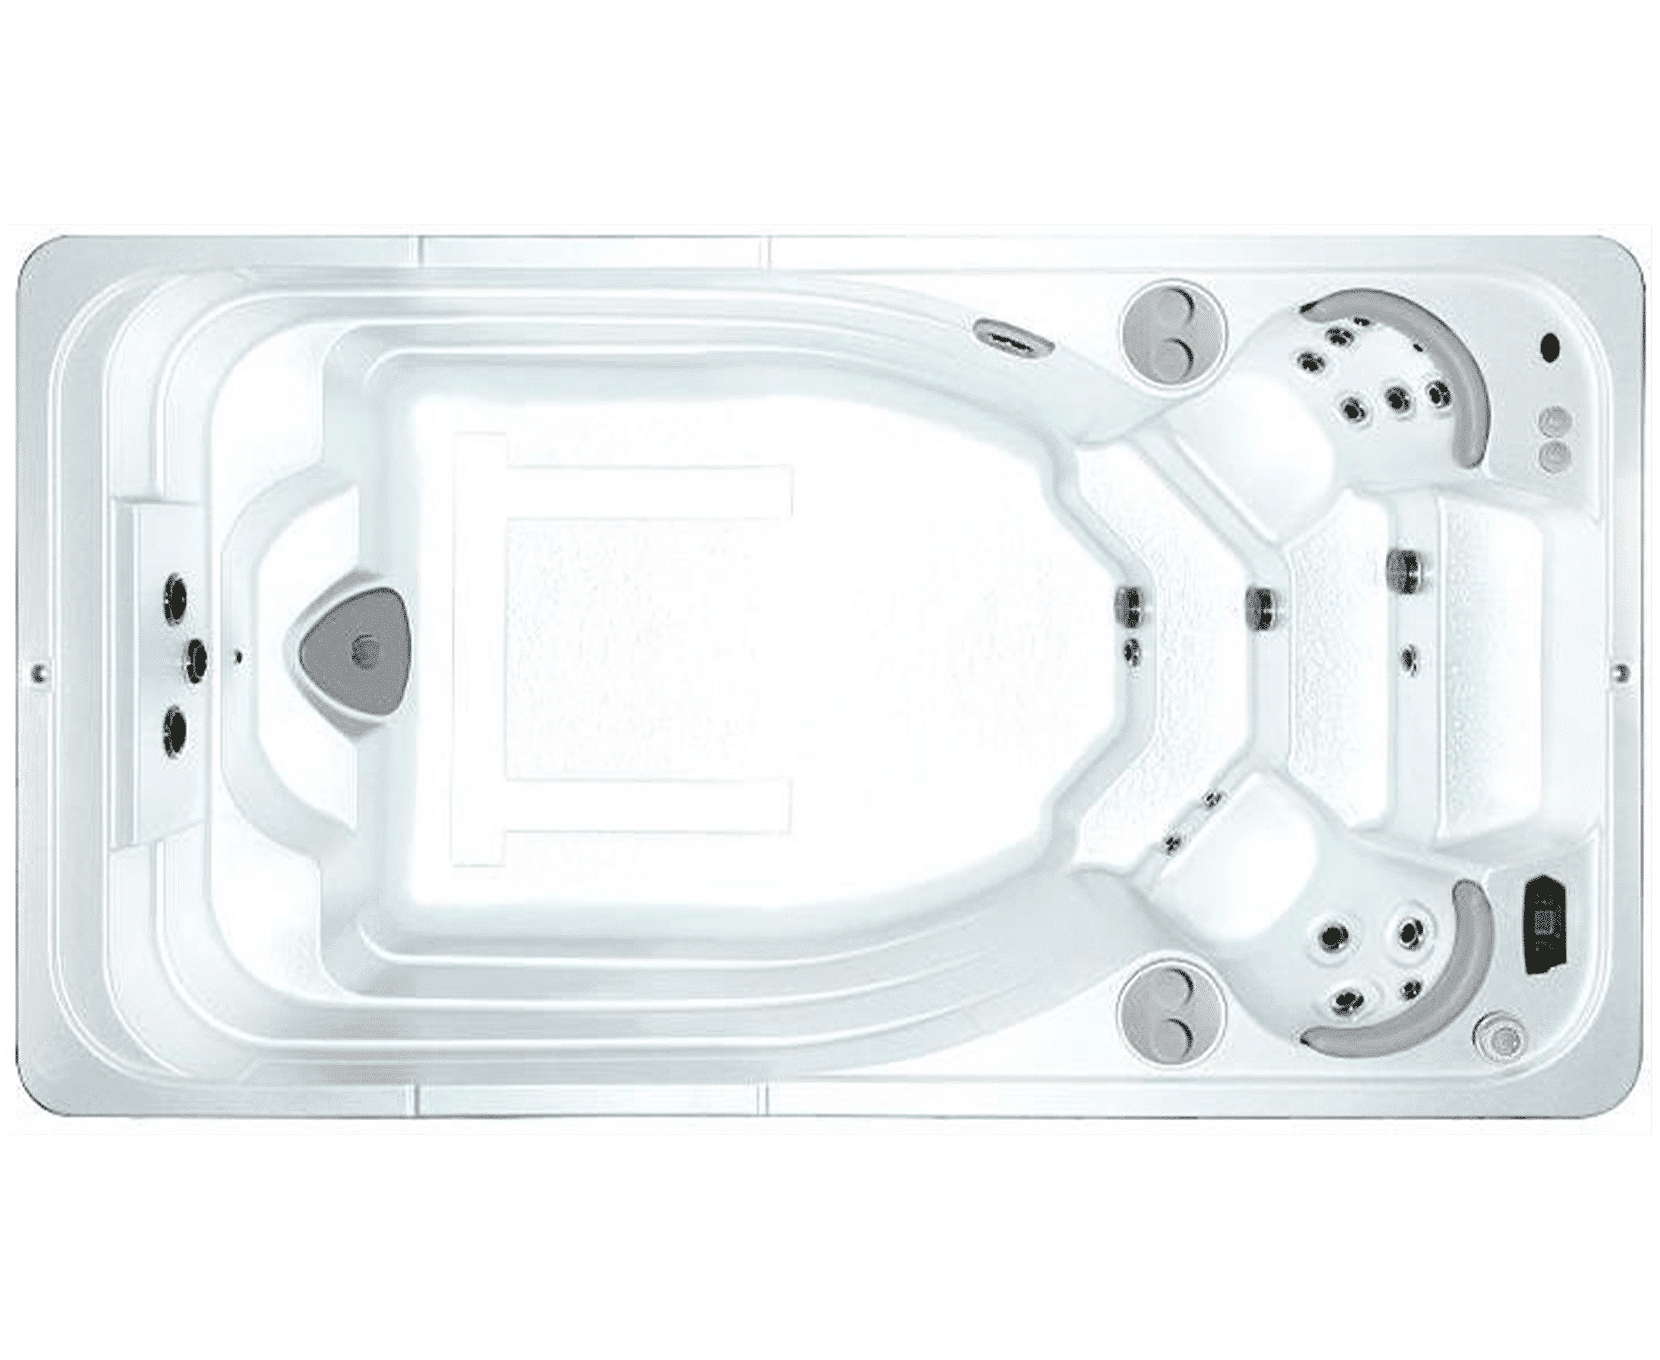 14-Foot Swim Spa Archives - Premium Hot Tubs - Fresno